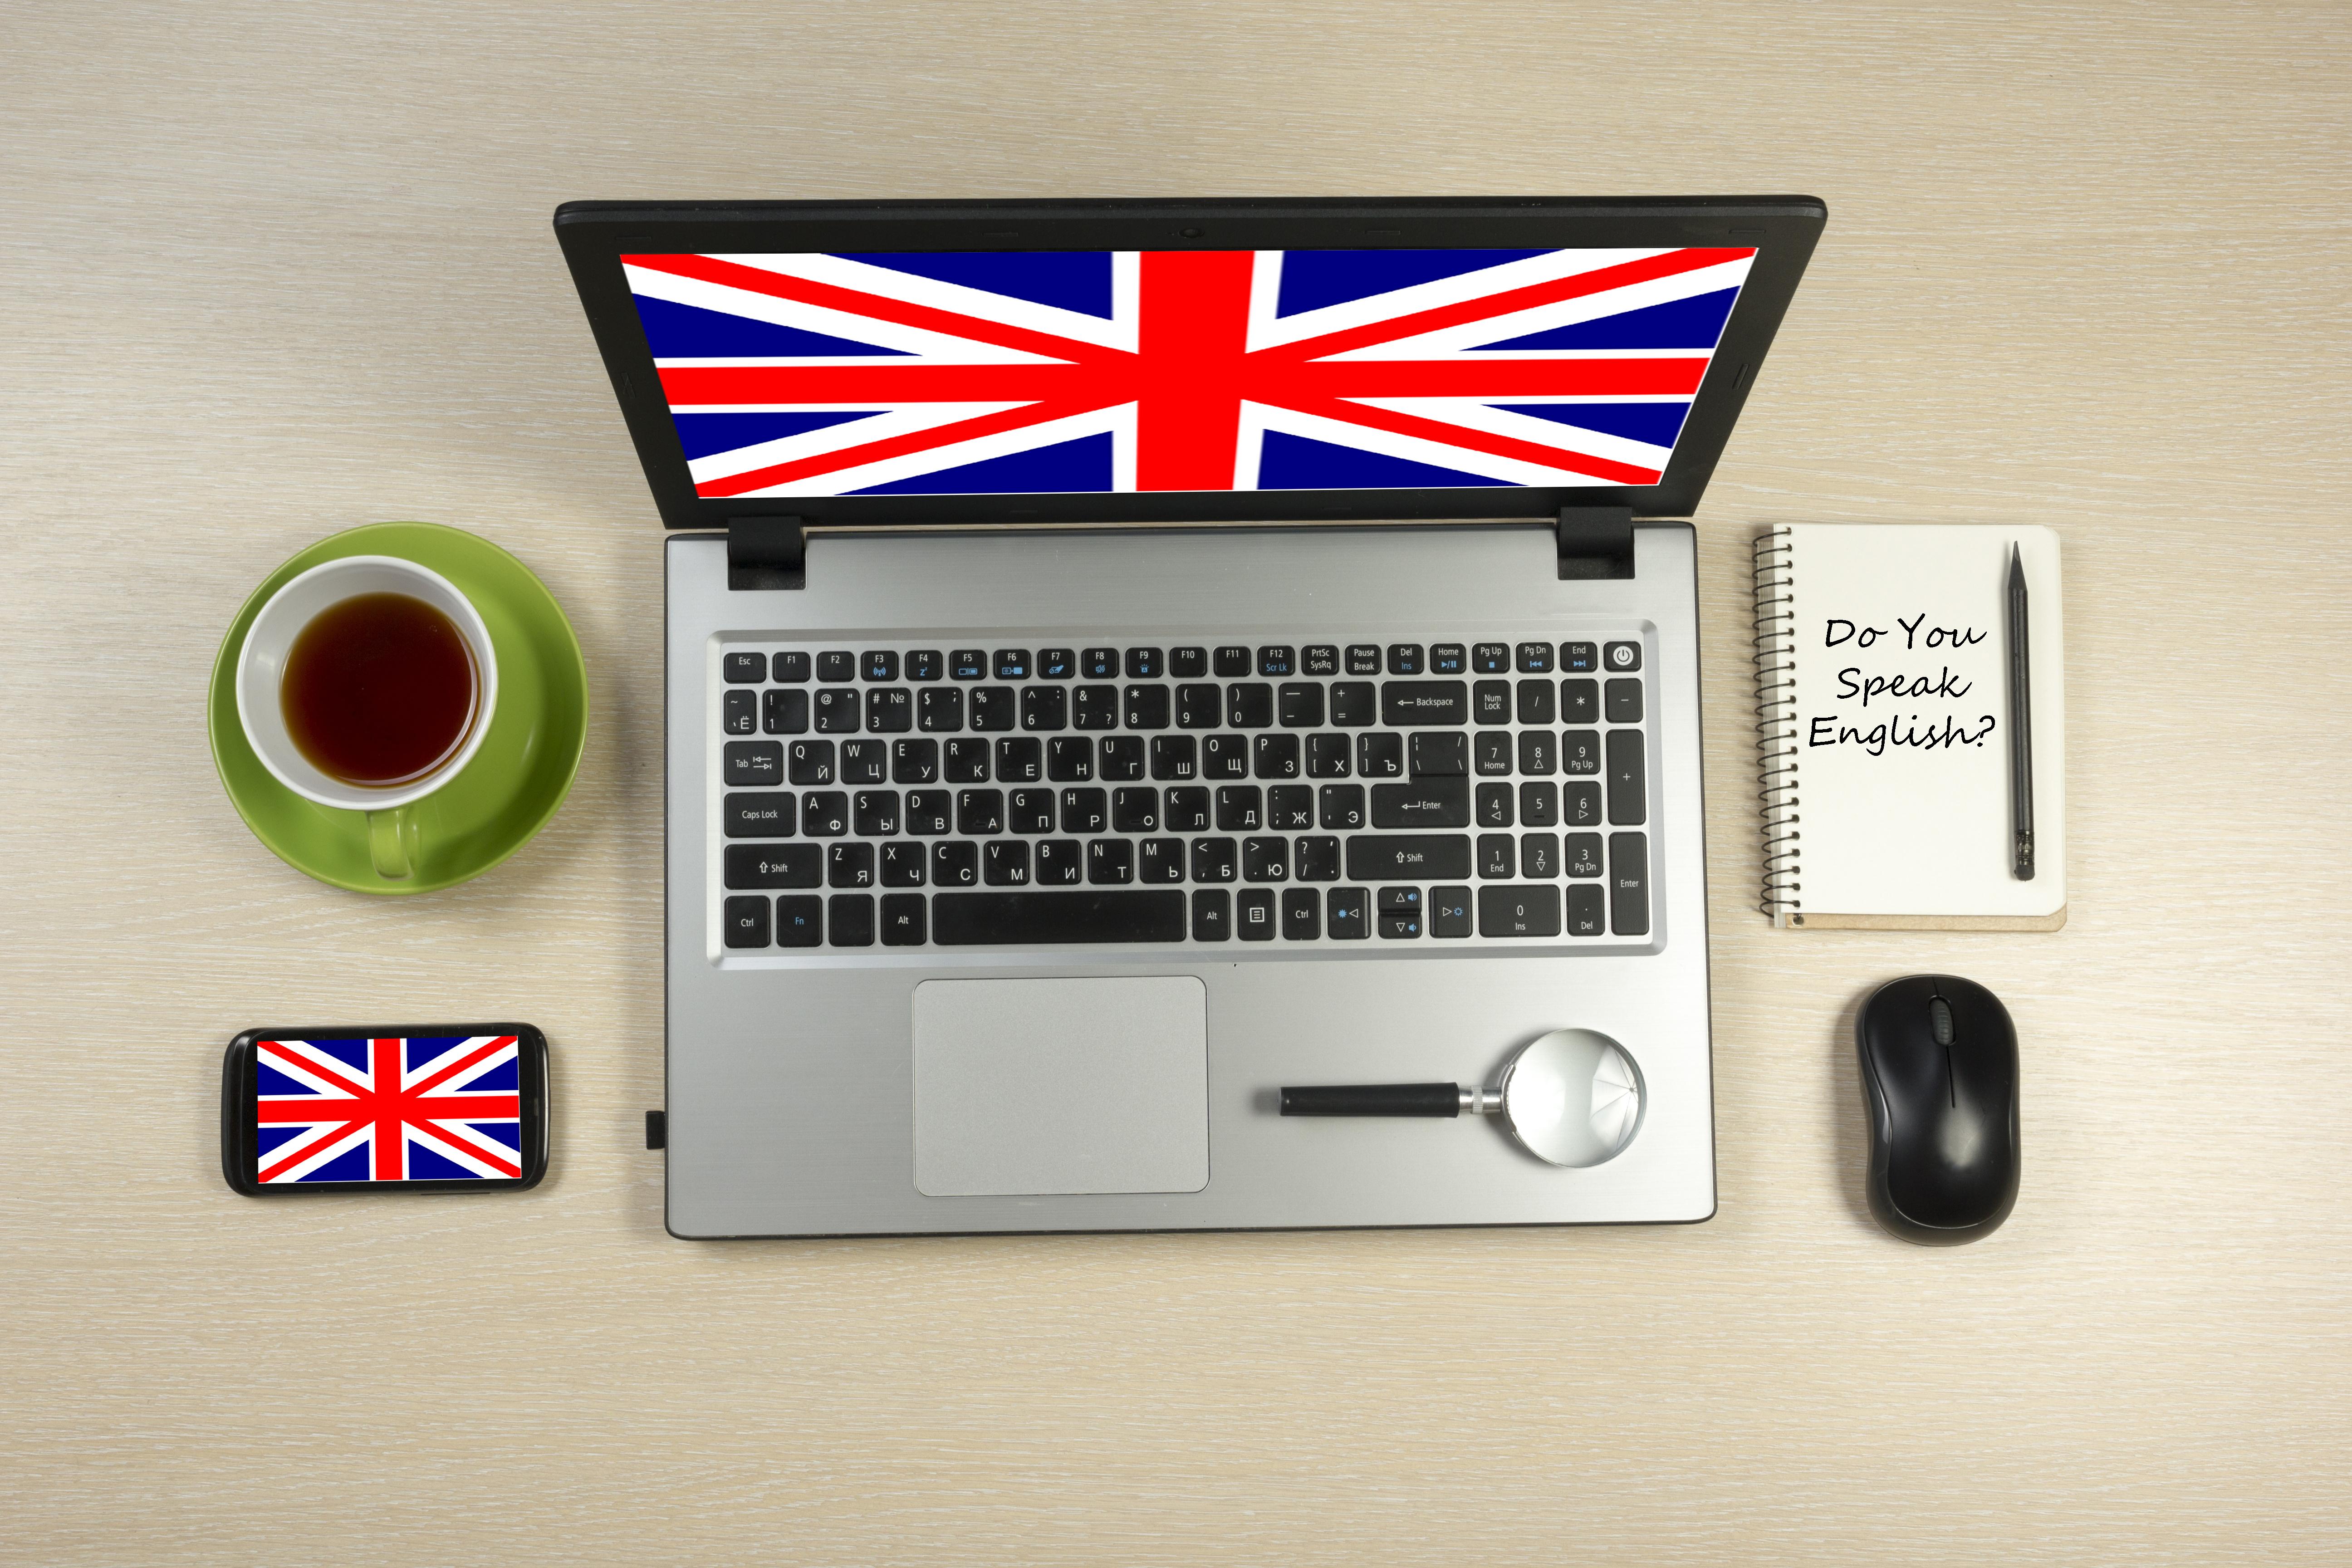 Frasi Utili Per Il Colloquio In Inglese Fourstars Blog